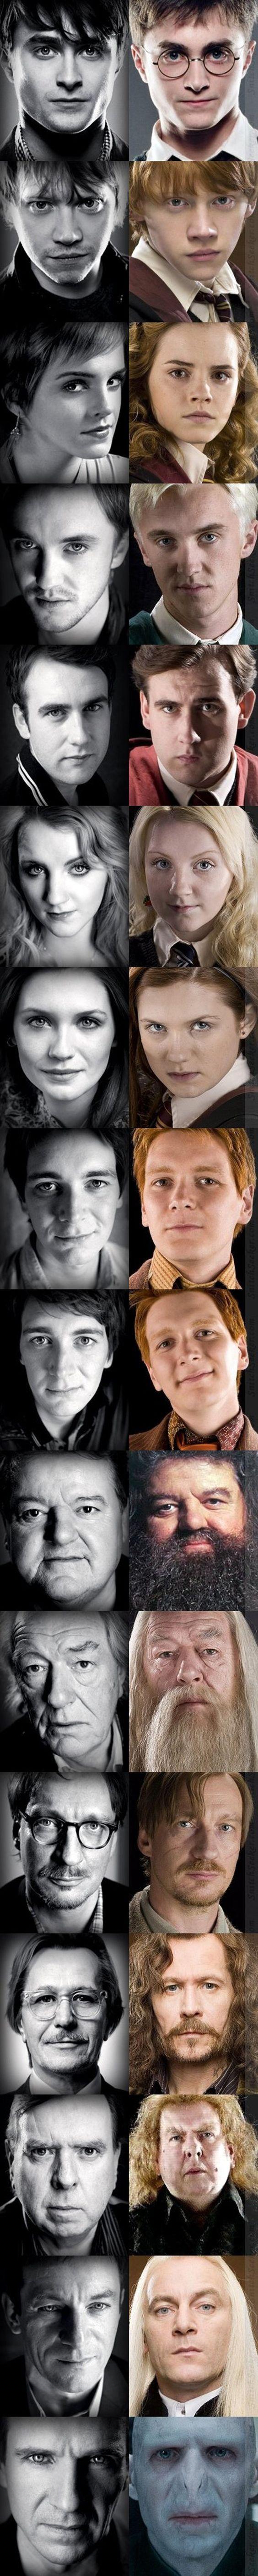 Cast Members Of Harry Potter – 20 Pics